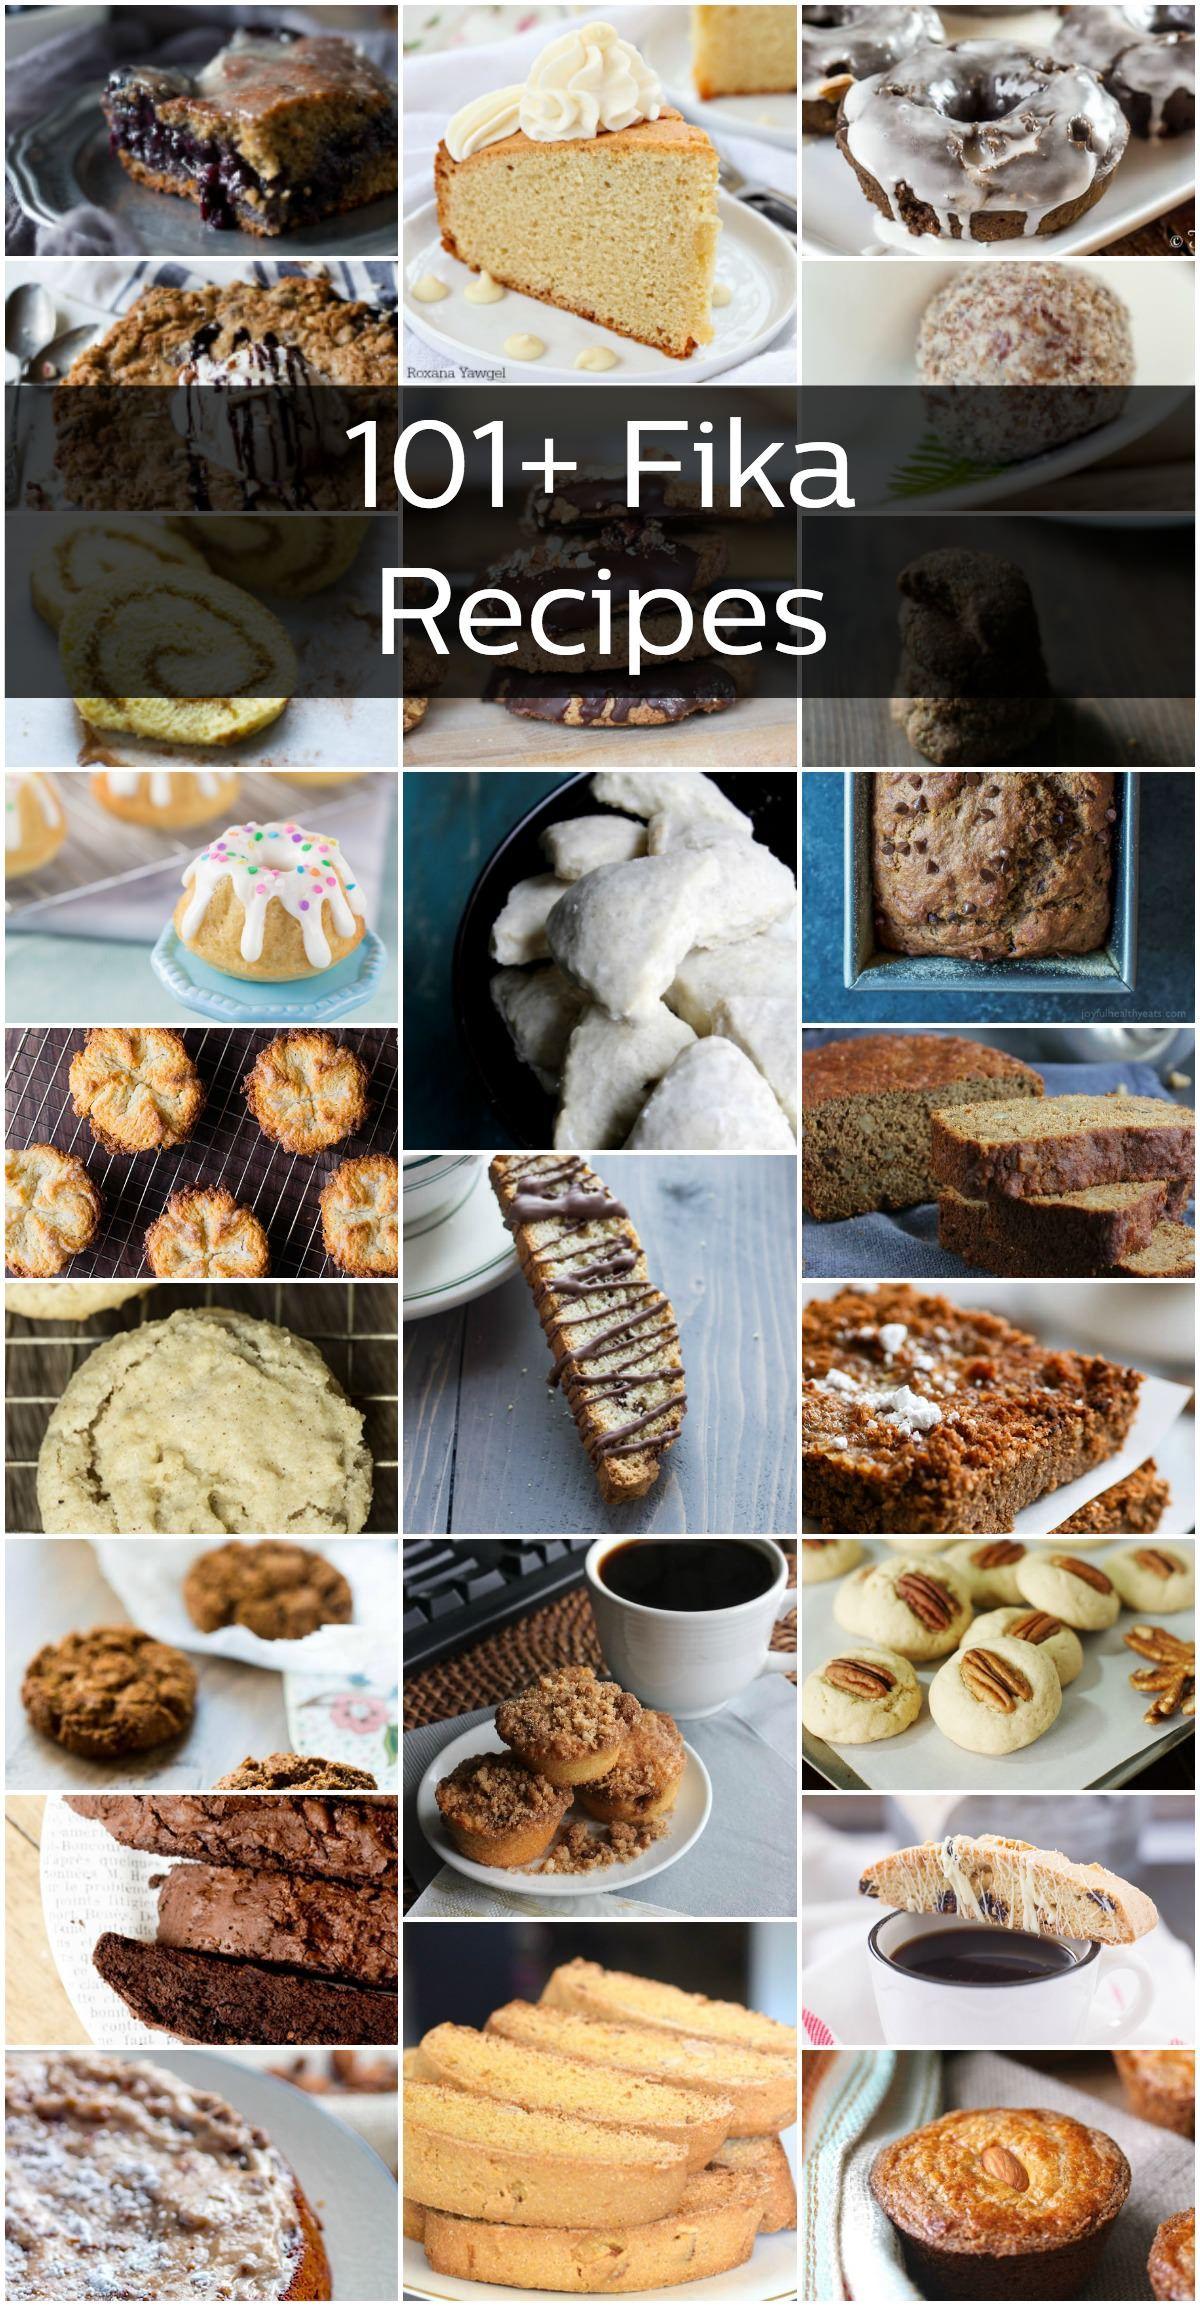 101 Recipes For Your Next Fika Swedish Recipes Recipes Scandinavian Food